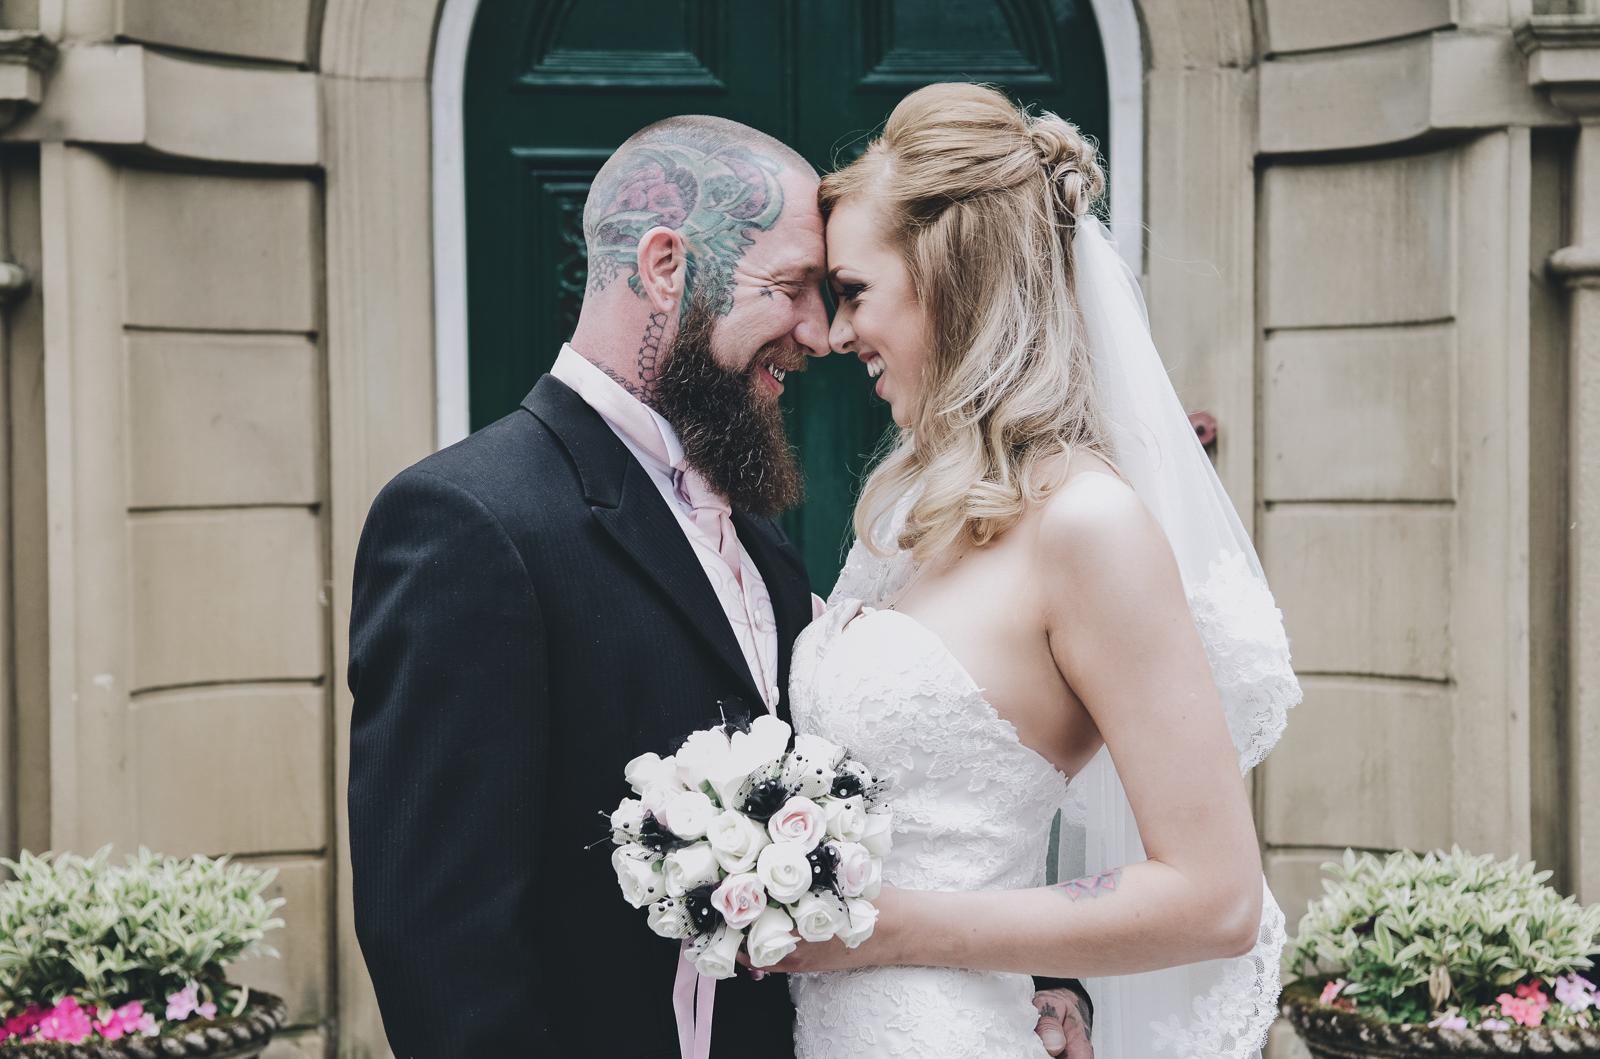 Alternative-North-West-Manchester-Wedding-Photography-Astley-bank-Wedding-skull-cake-tattooed-groom-18.jpg